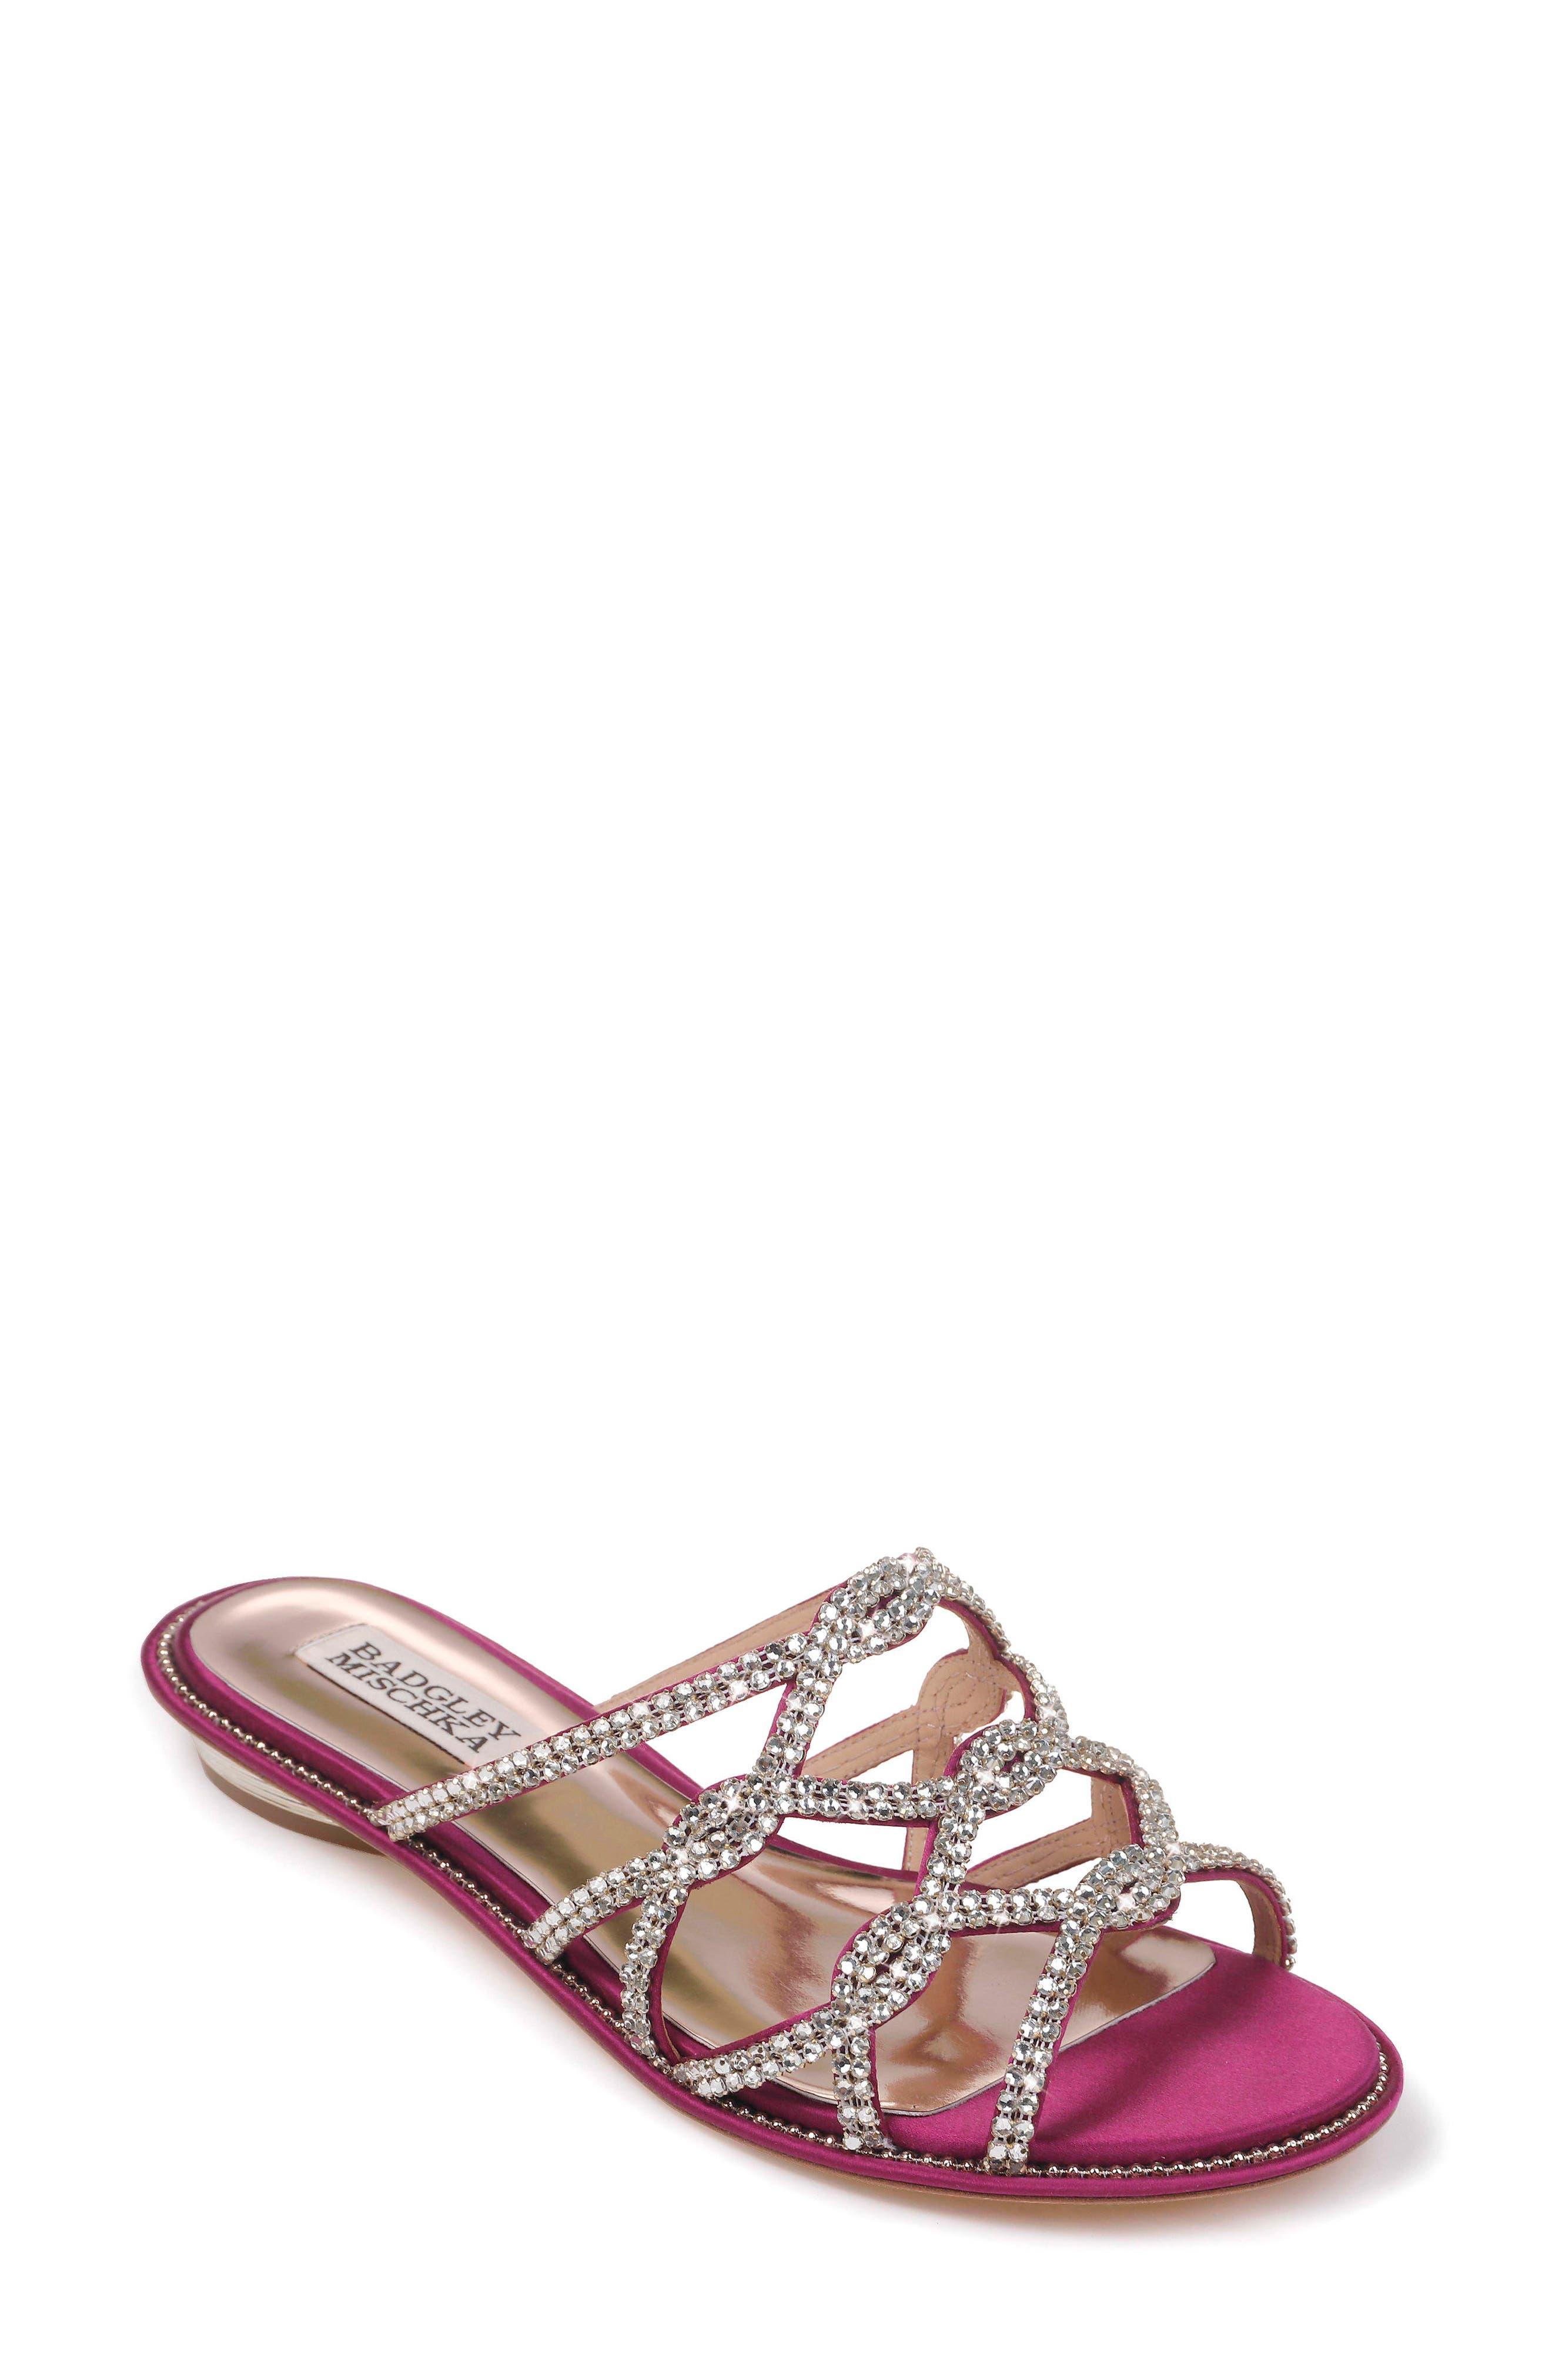 Badgley Mischka Sofie Strappy Sandal, Purple